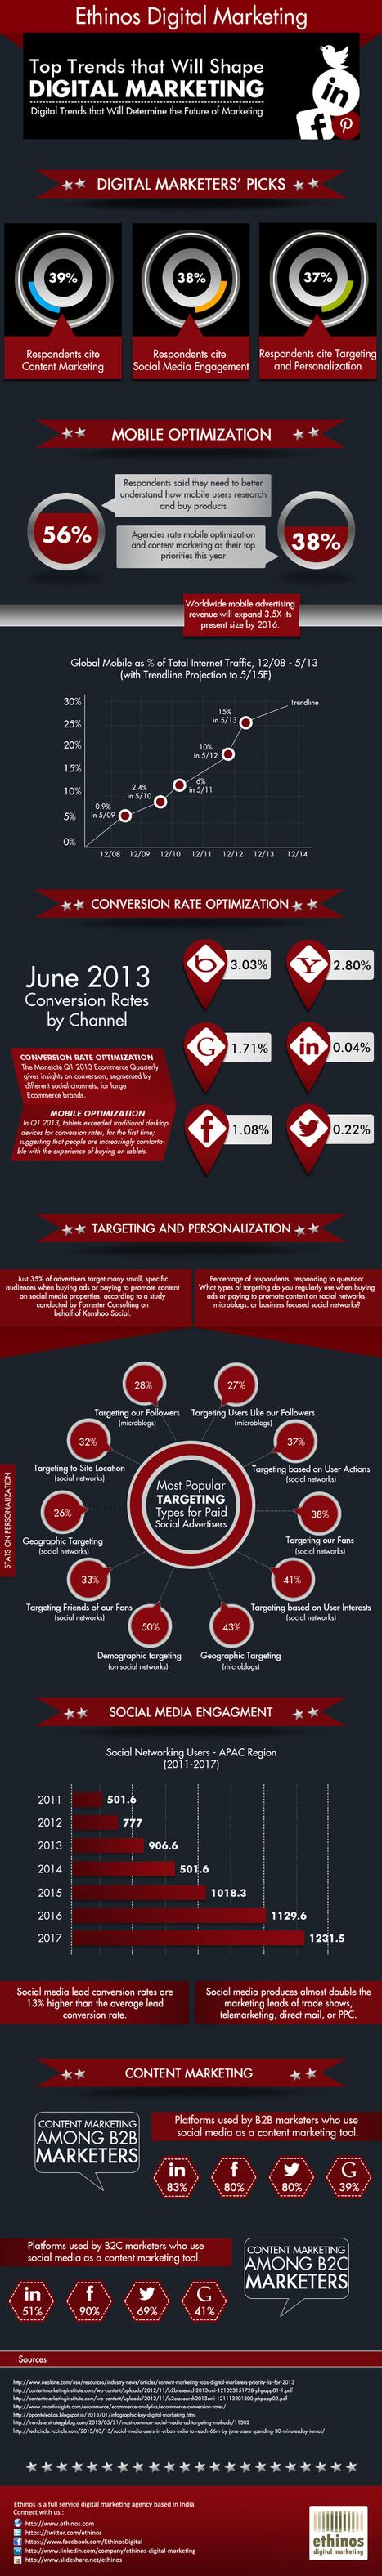 Top Trends that Will Shape Digital Marketing [Infographic] - Ethinos Digital Marketing | #TheMarketingAutomationAlert | Digital Marketing Bites | Scoop.it